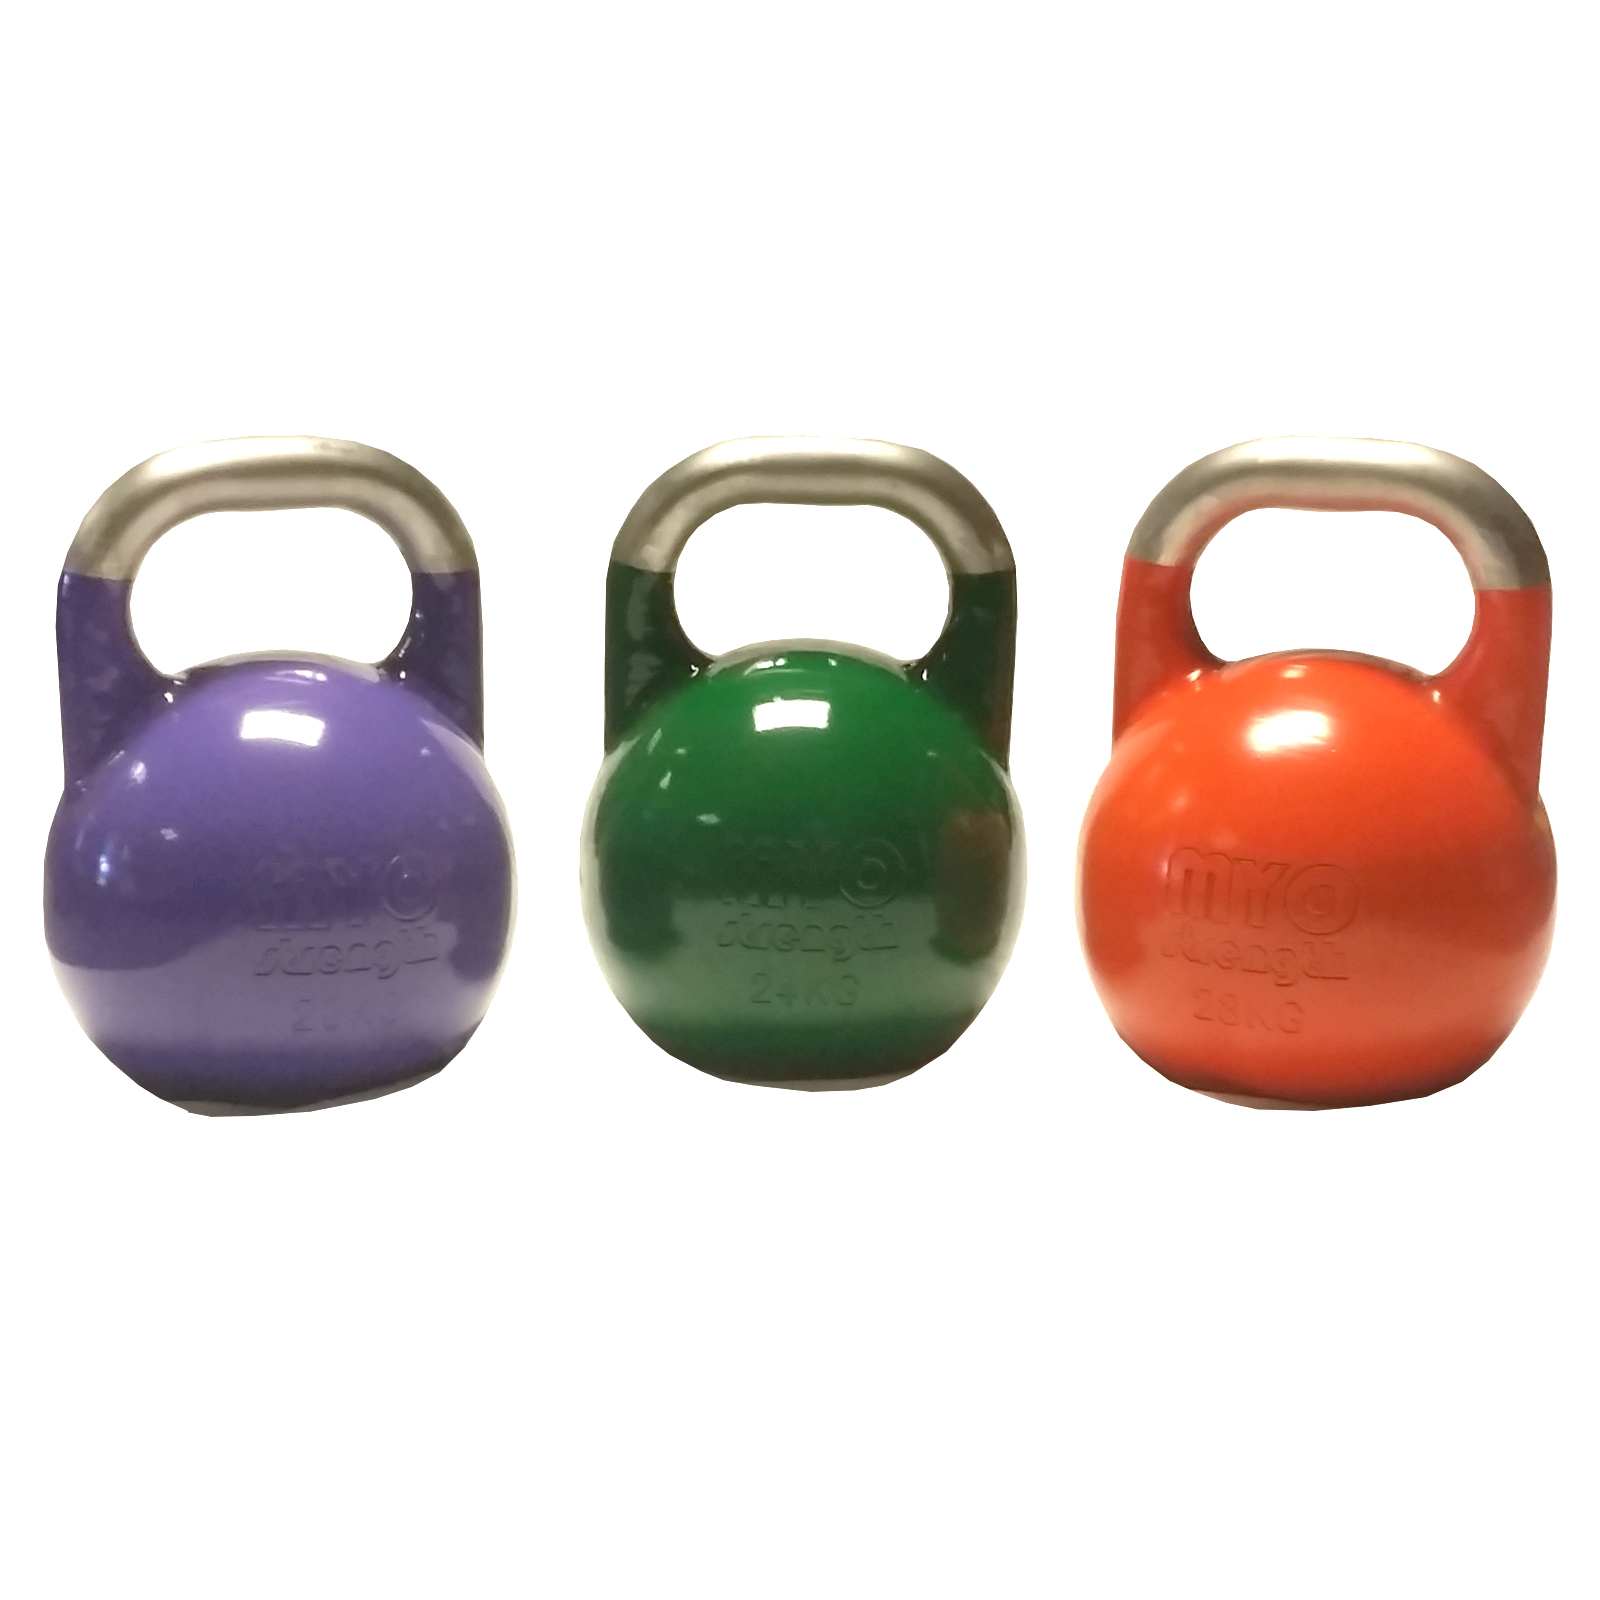 MYO Strength 4kg Competition Kettlebell